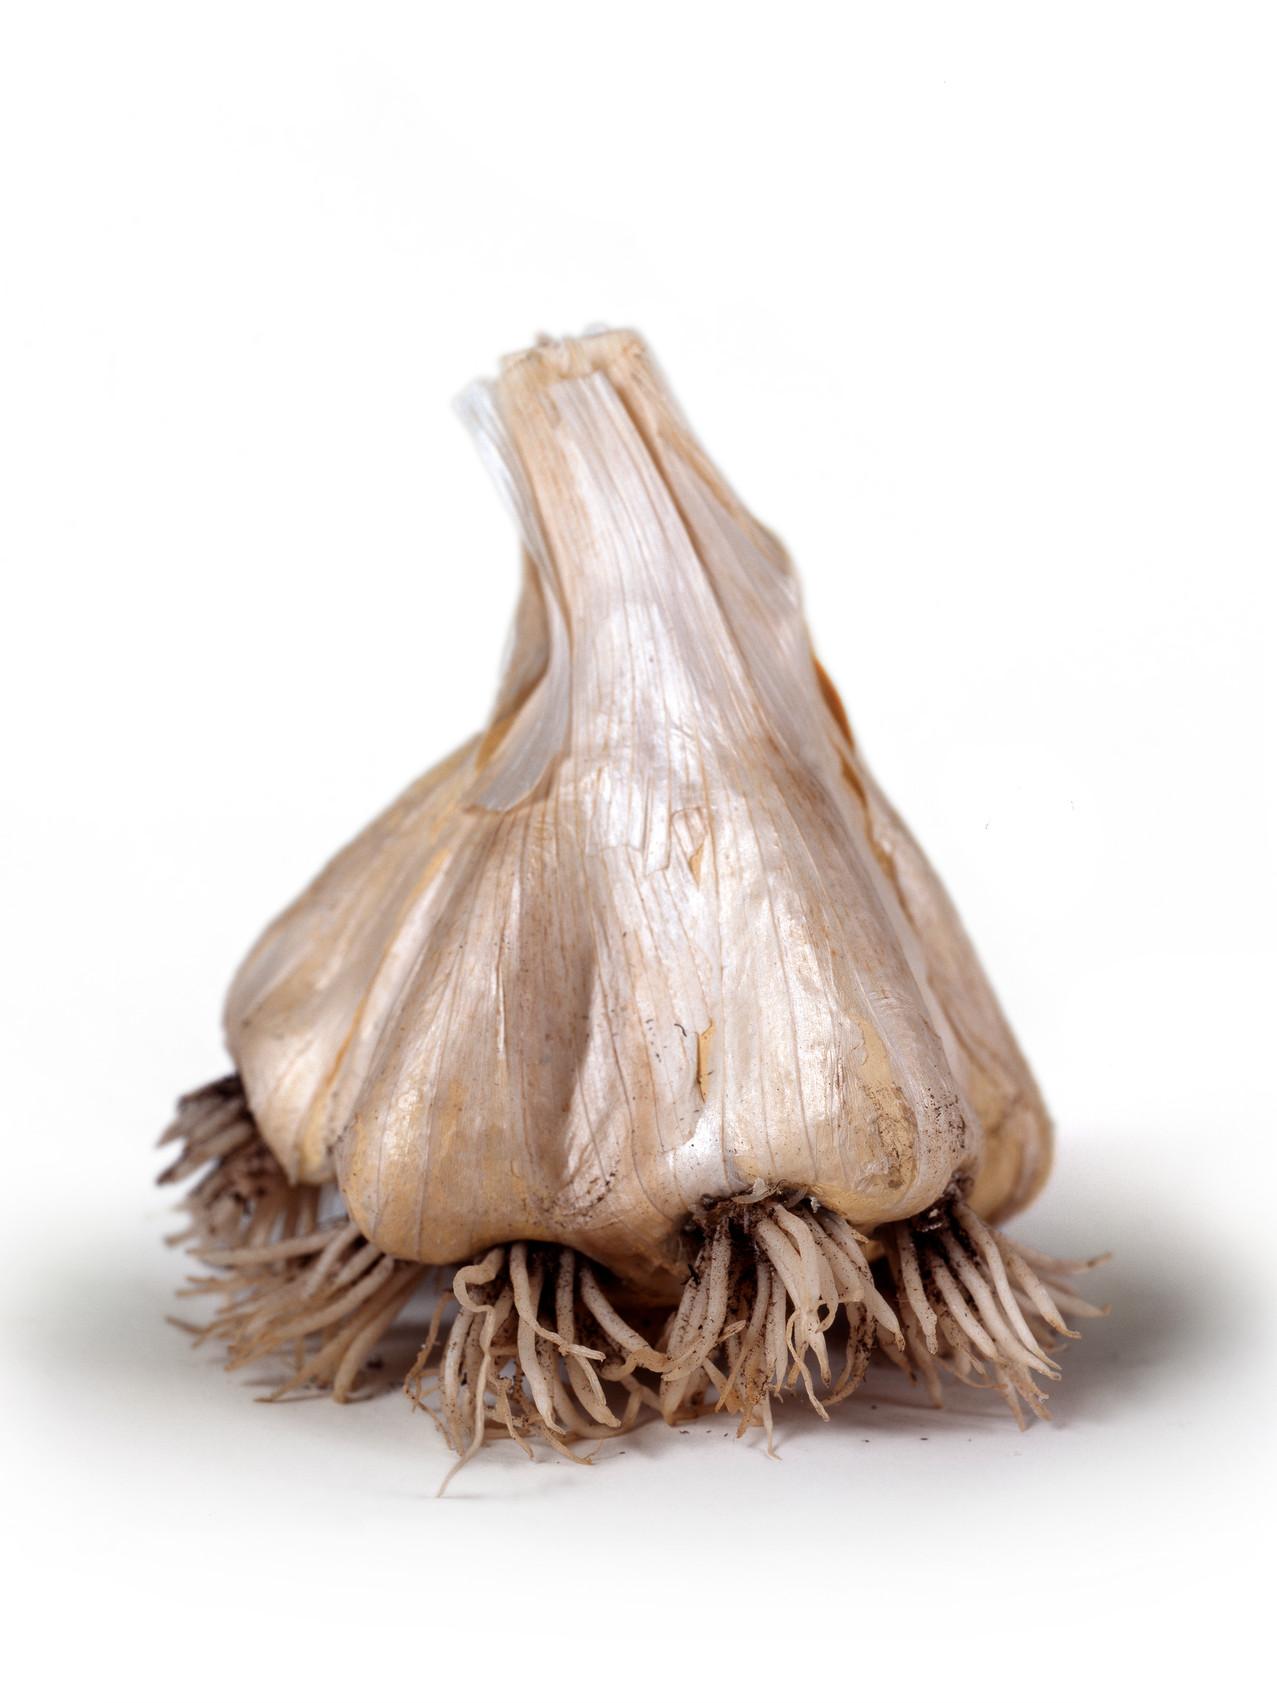 Odiferous Garlic